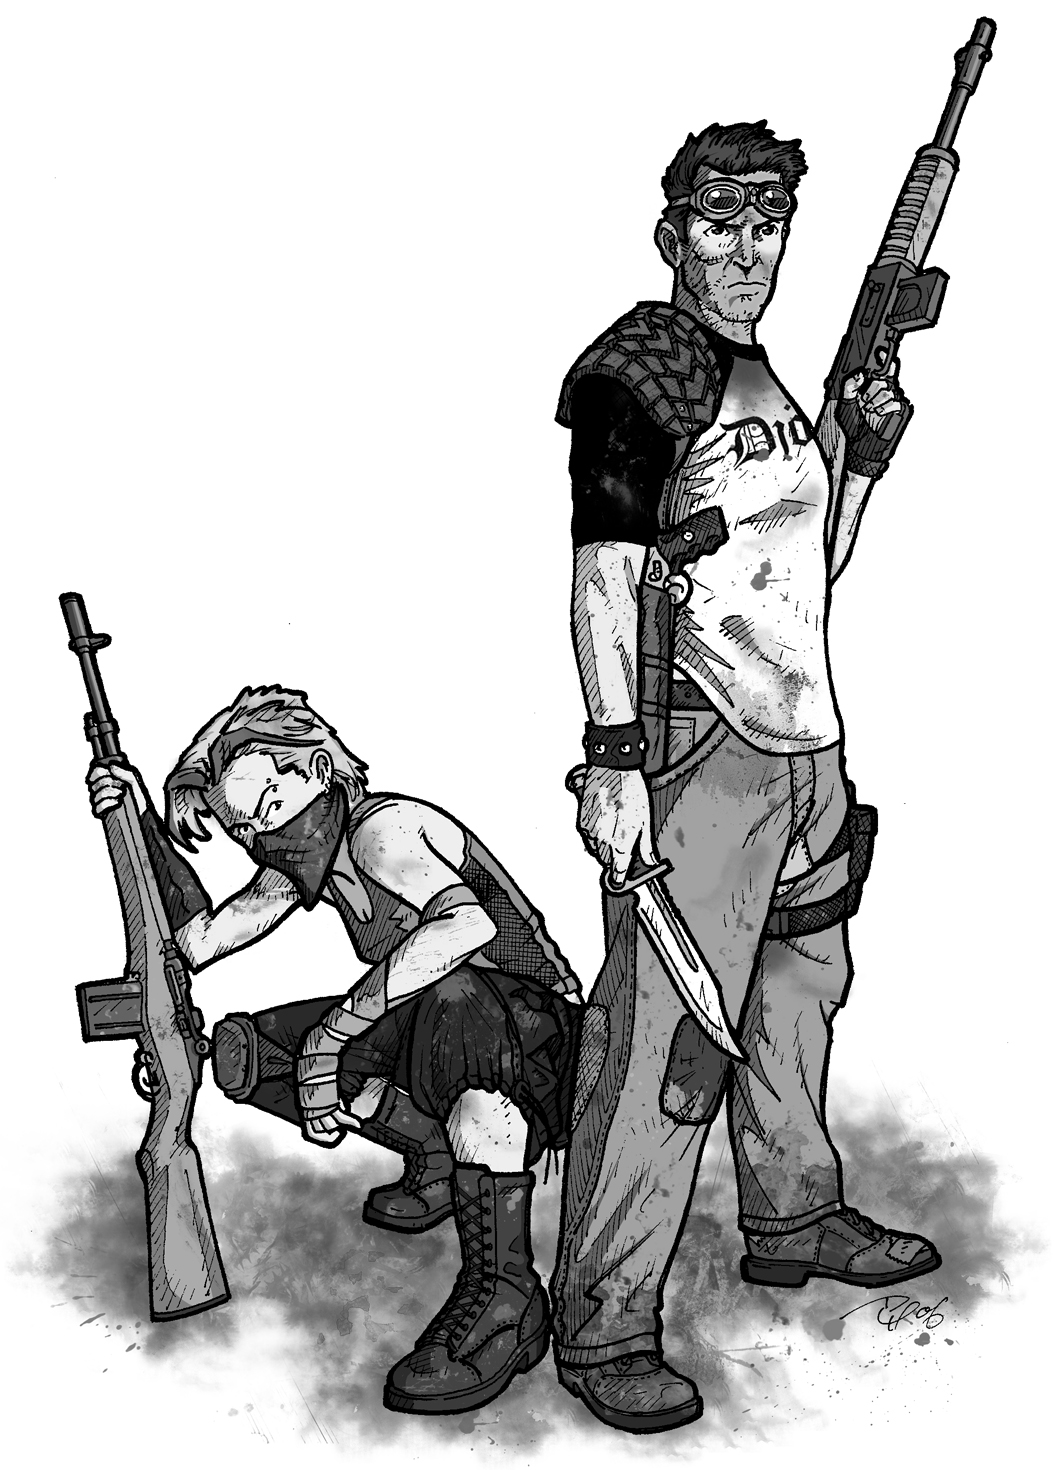 Fallout_d20___City_Dwellers_by_Tensen01.jpg